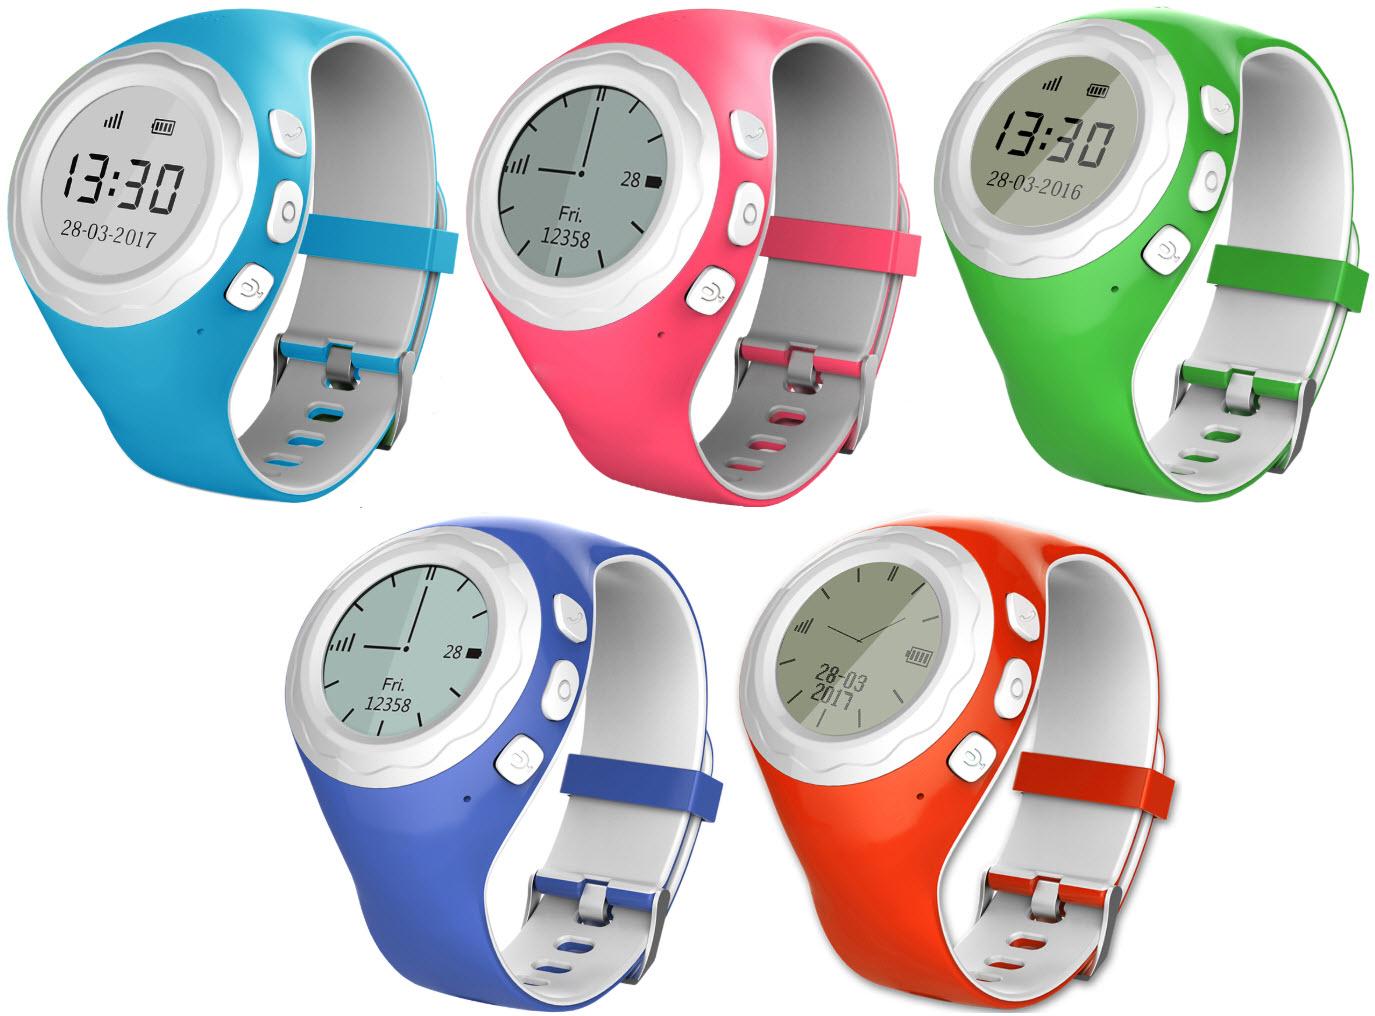 Die PINGONAUT PANDA GPS Kind-Smartwatch gibt es in fünf Farben bei smartwatch.de